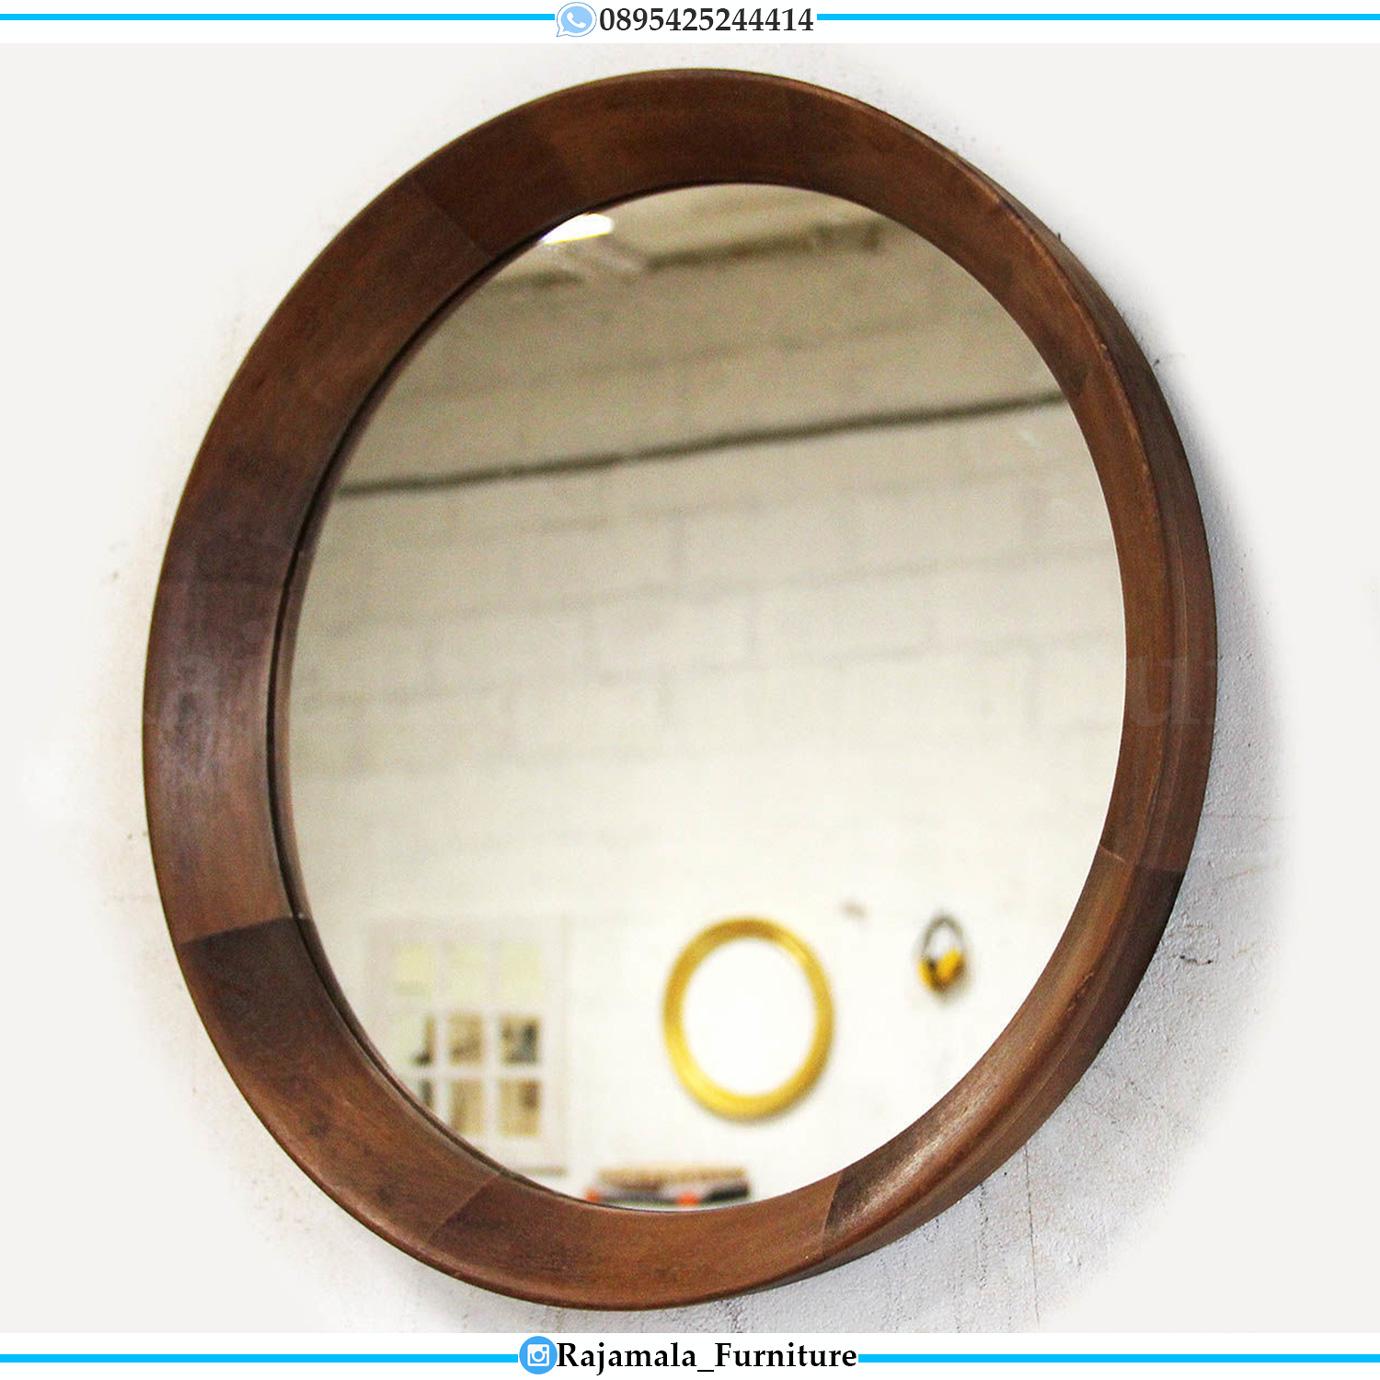 Best Seller Cermin Hias Dinding Minimalis Desain Simple RM-0507